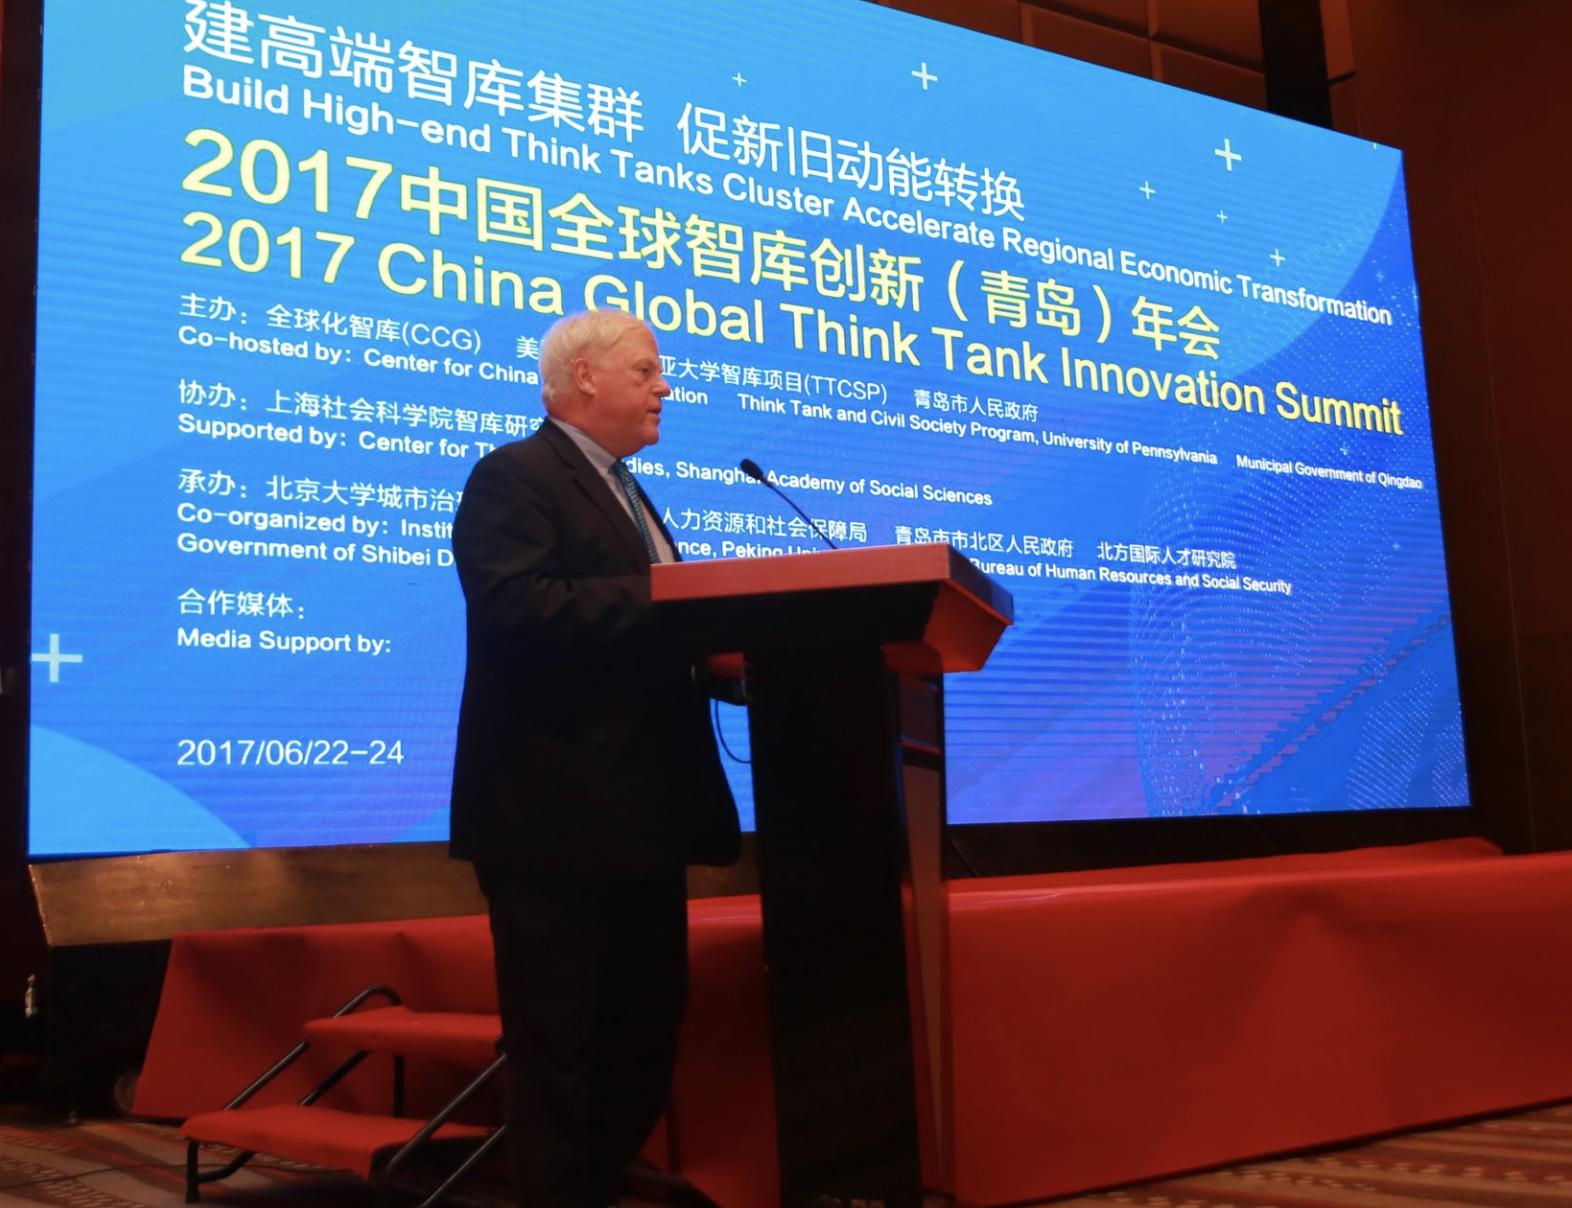 Dr. McGann at the 2017 China Global Think Tank Innovation Summit